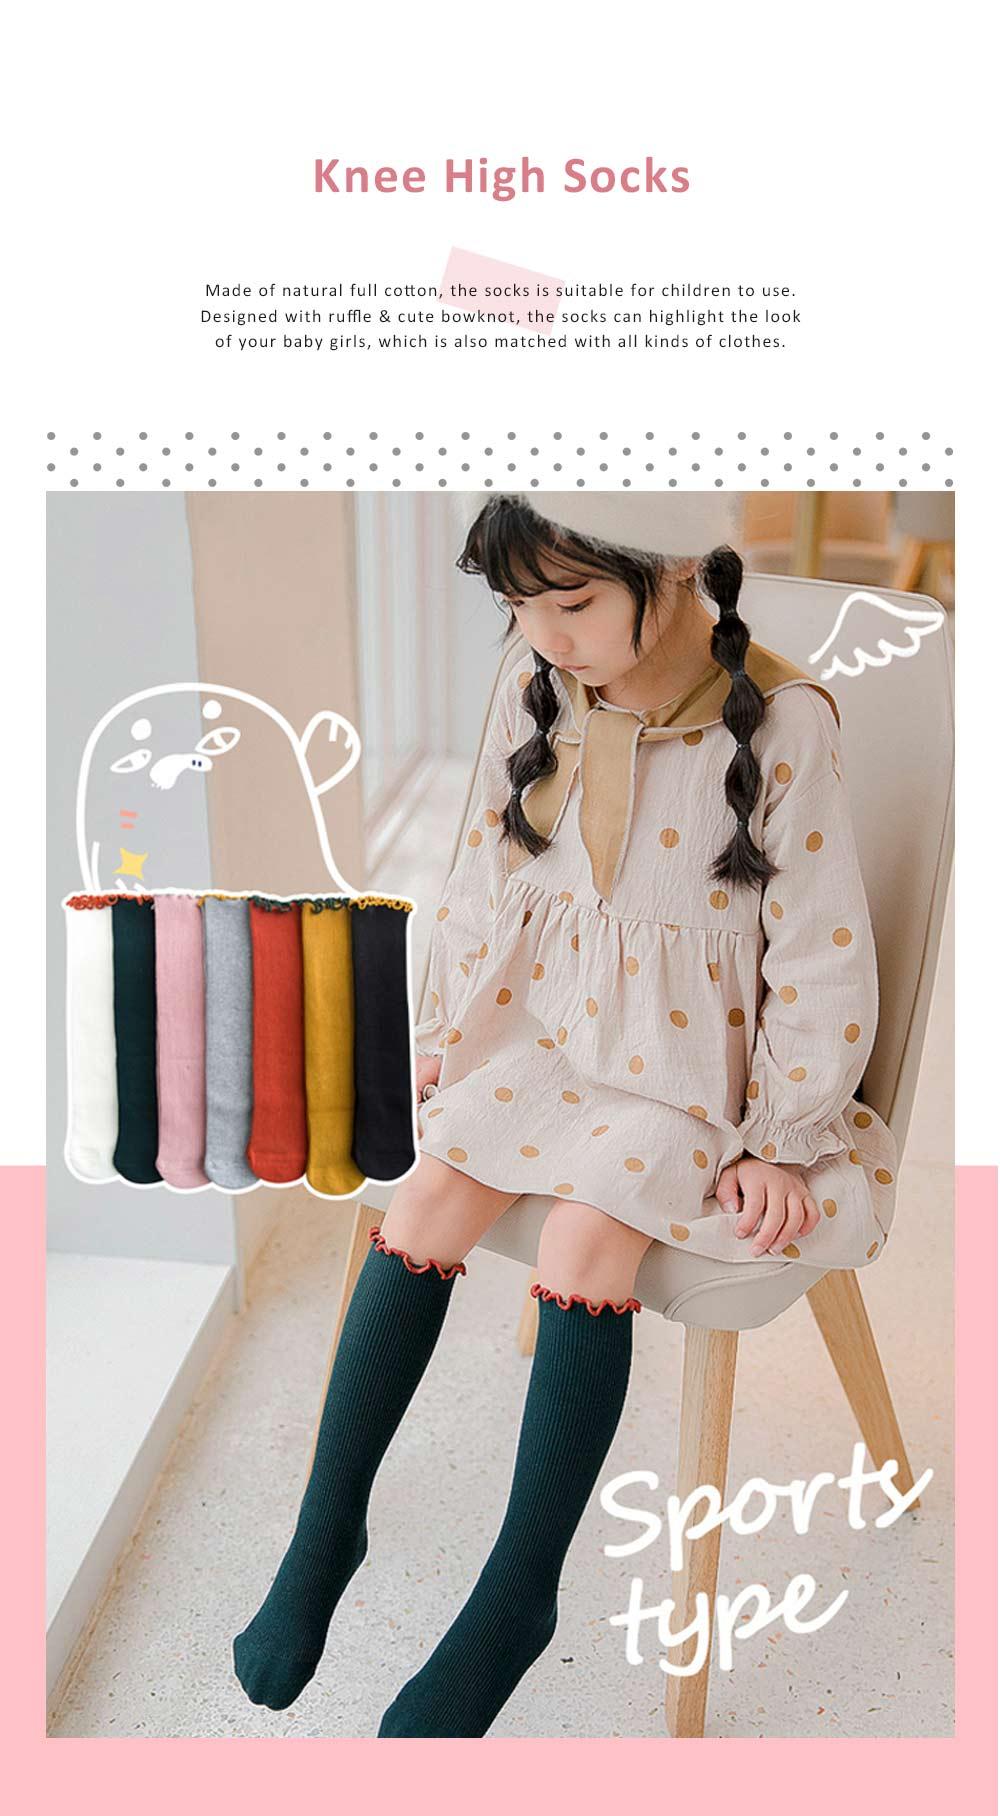 Korean Style Knee High Socks Cute Bowknot Cotton Knit Dress Socks Ruffled Shape Baby Stocking for Girls 0